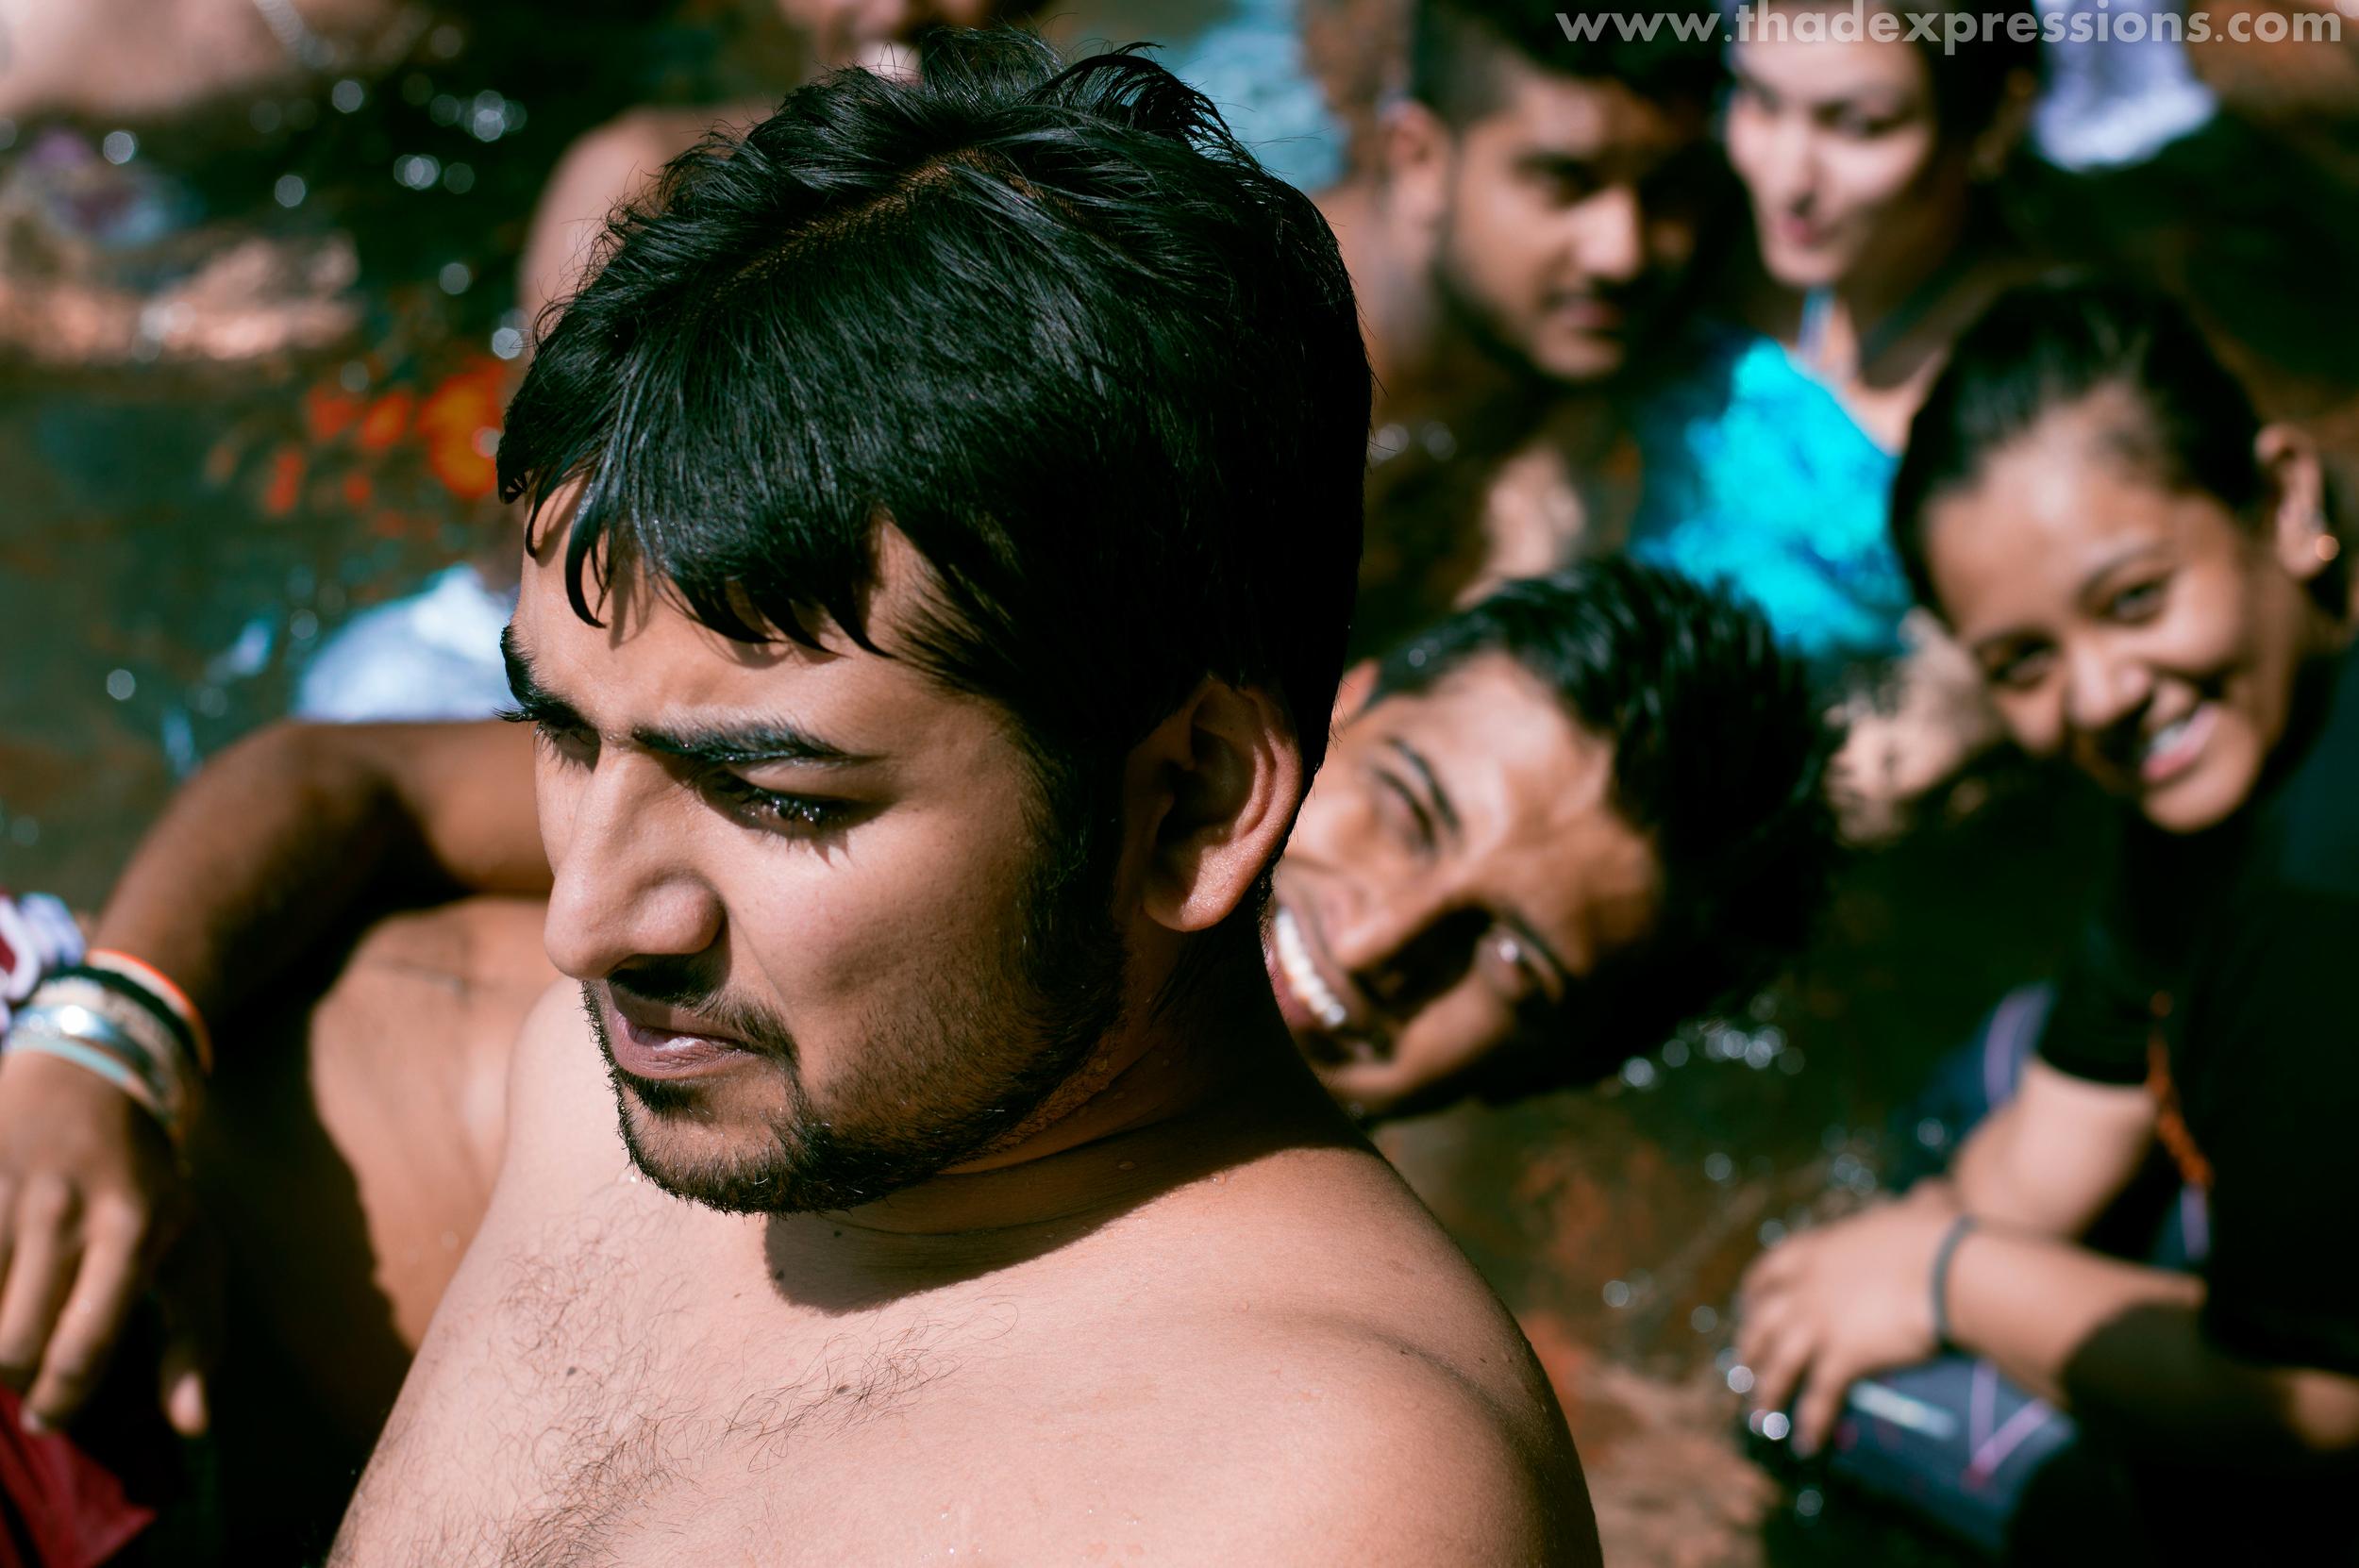 Nakul Shah SWIM LAKE CHALA 093803.JPG